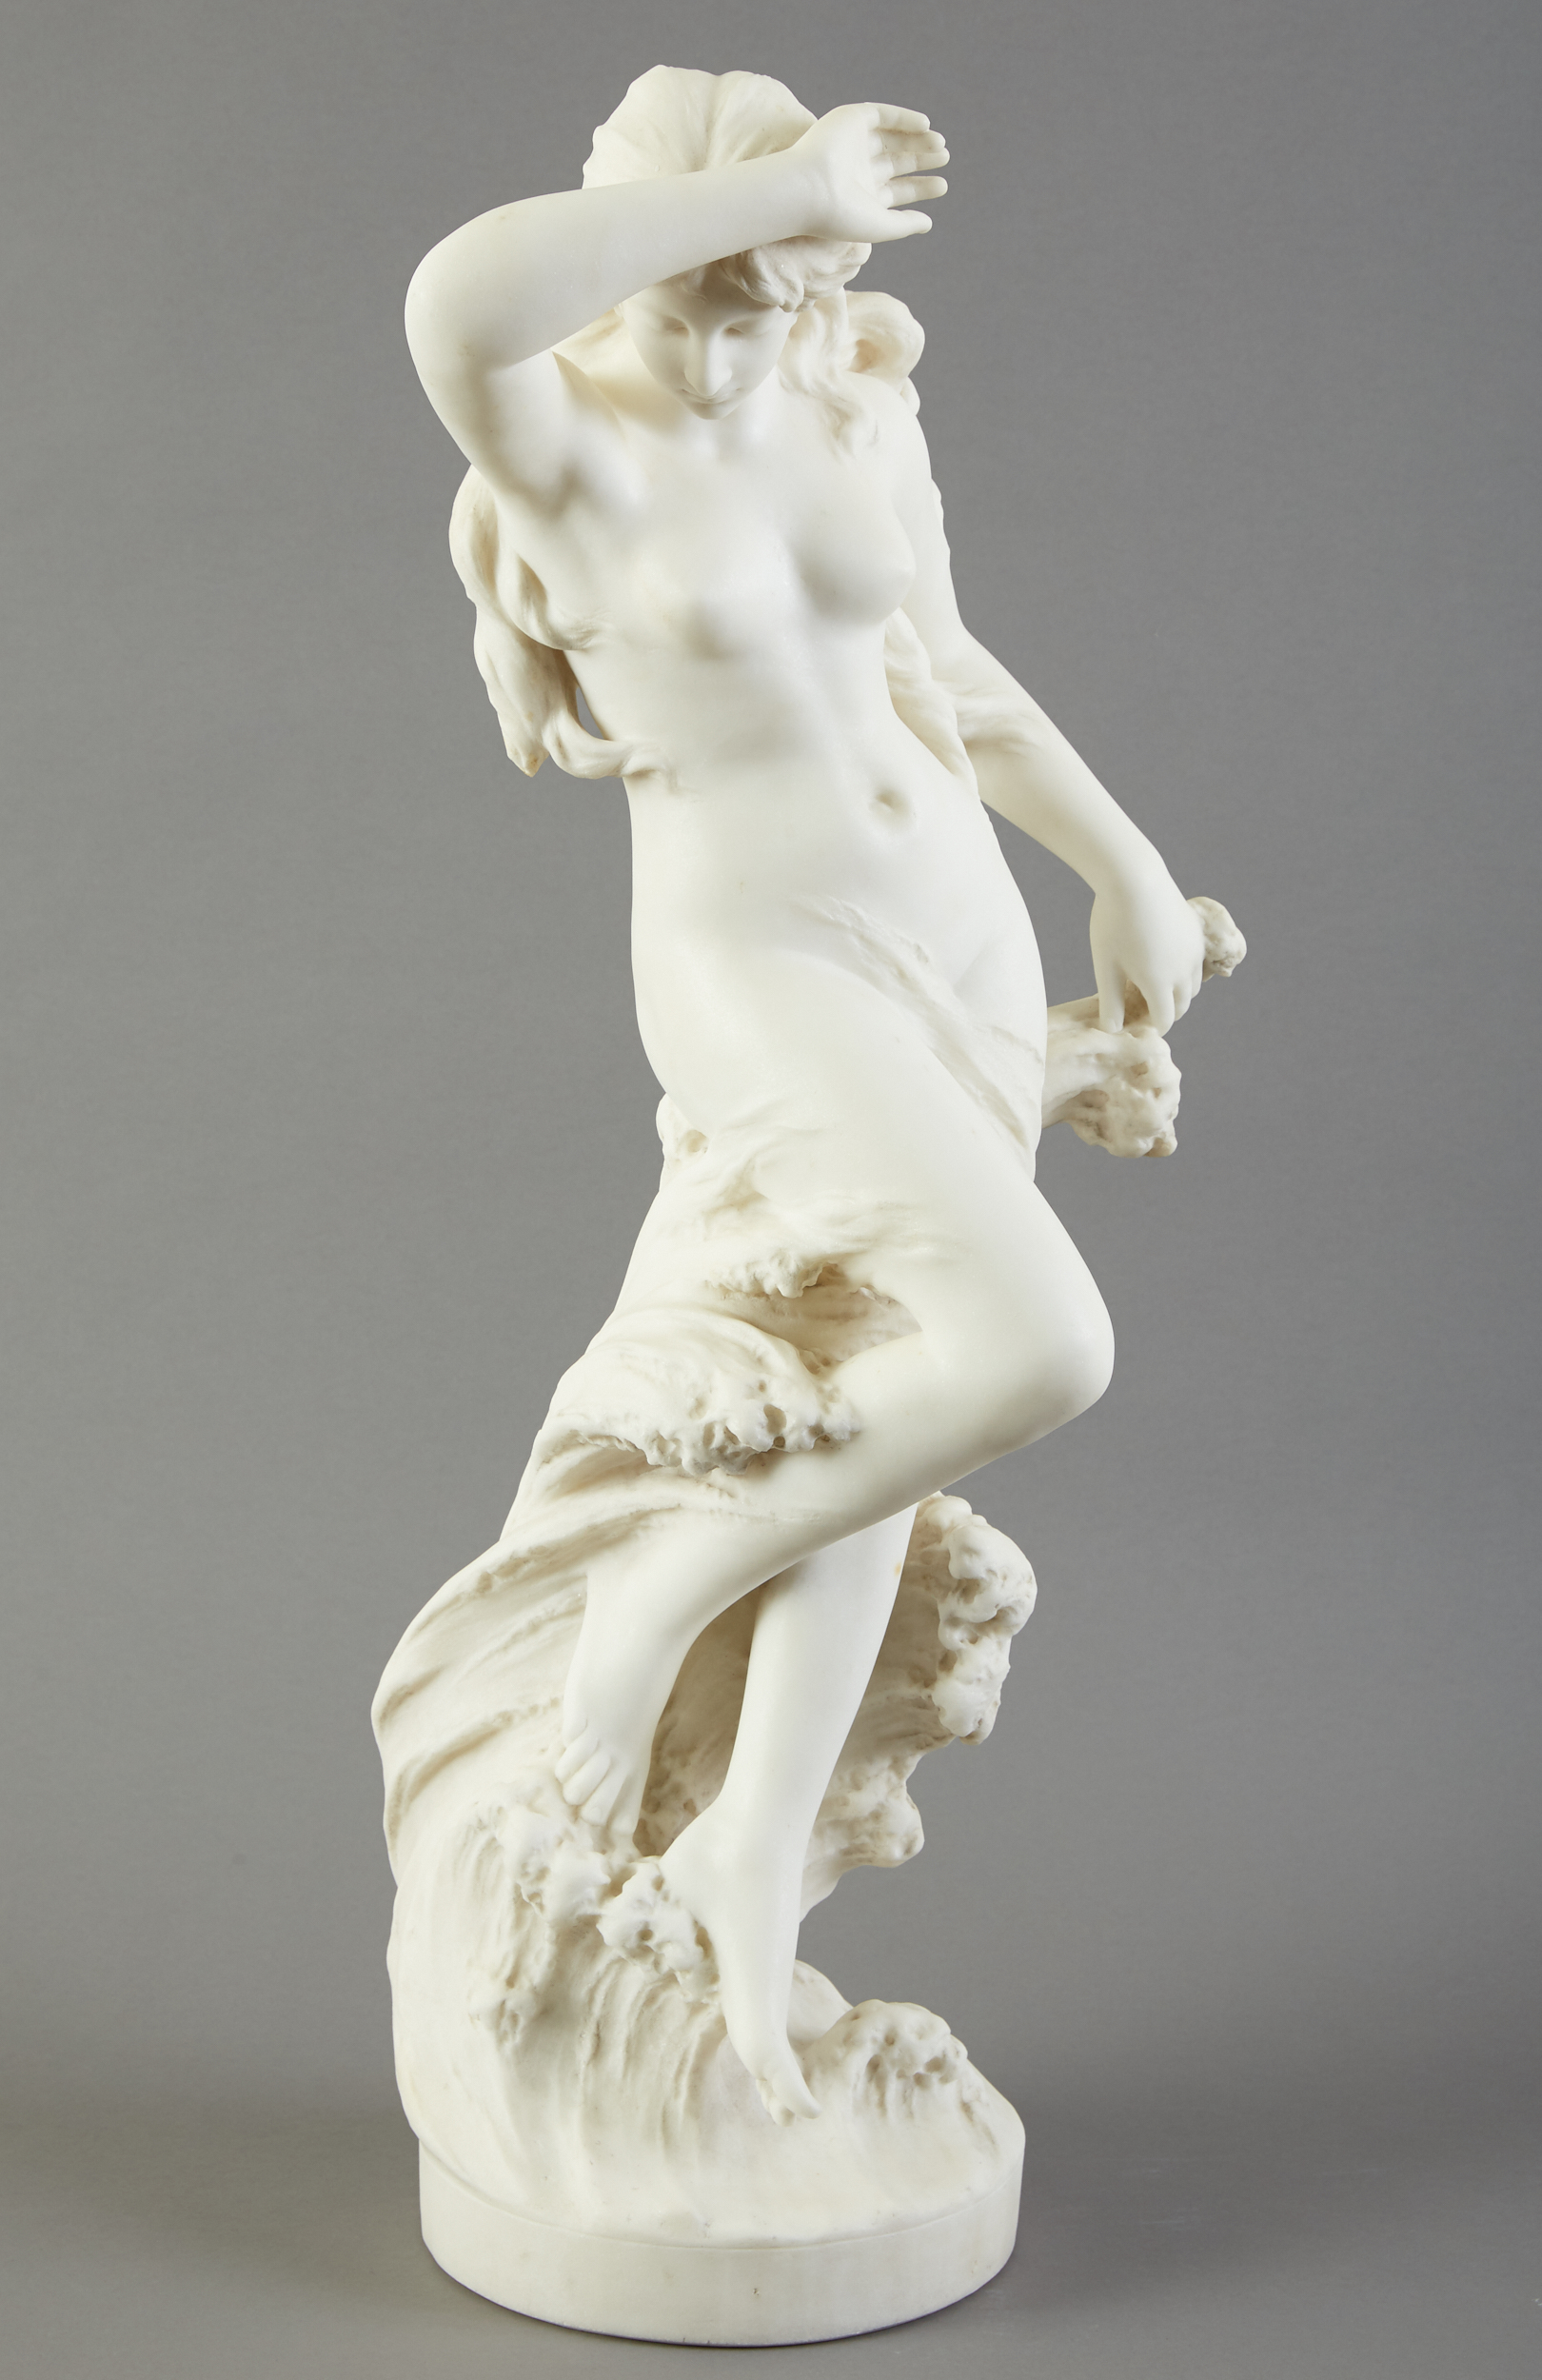 Lot 81 - A. Piazza Daphne Marble Sculpture